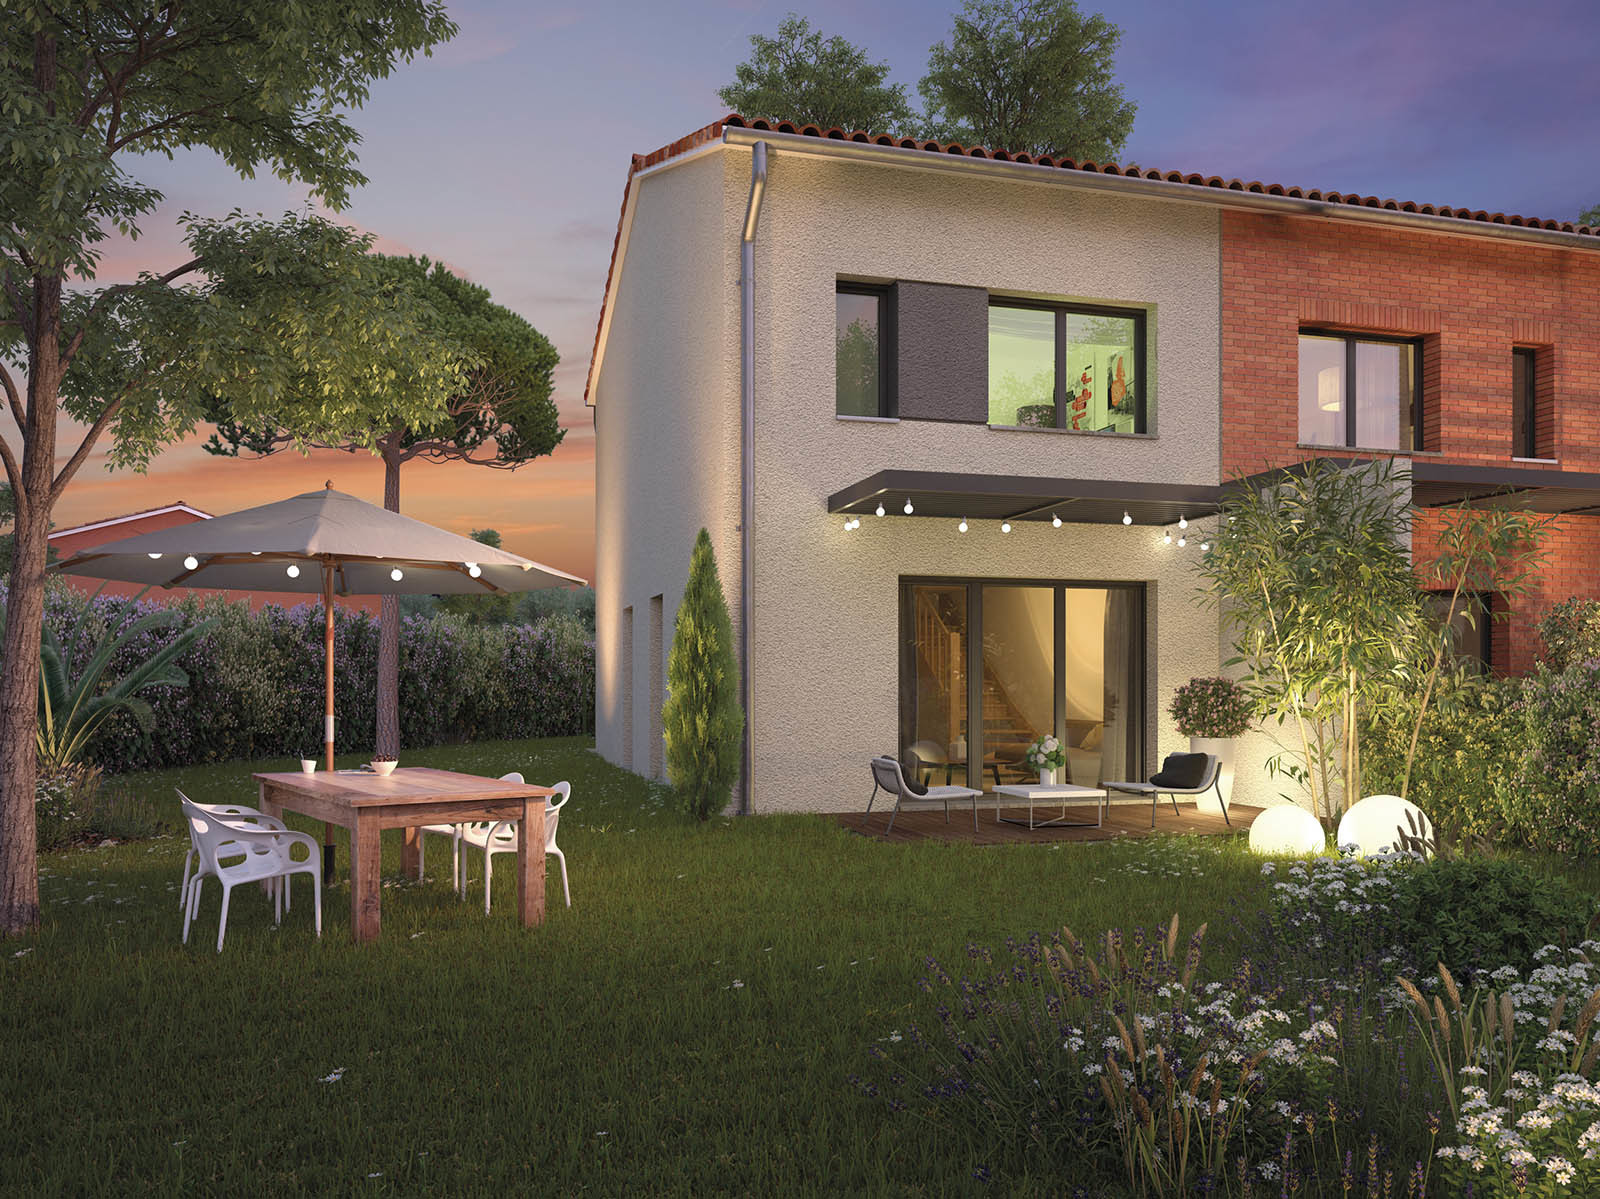 Programme immobilier les villas d t castanet tolosan for Salon jardin villa esmeralda tultitlan